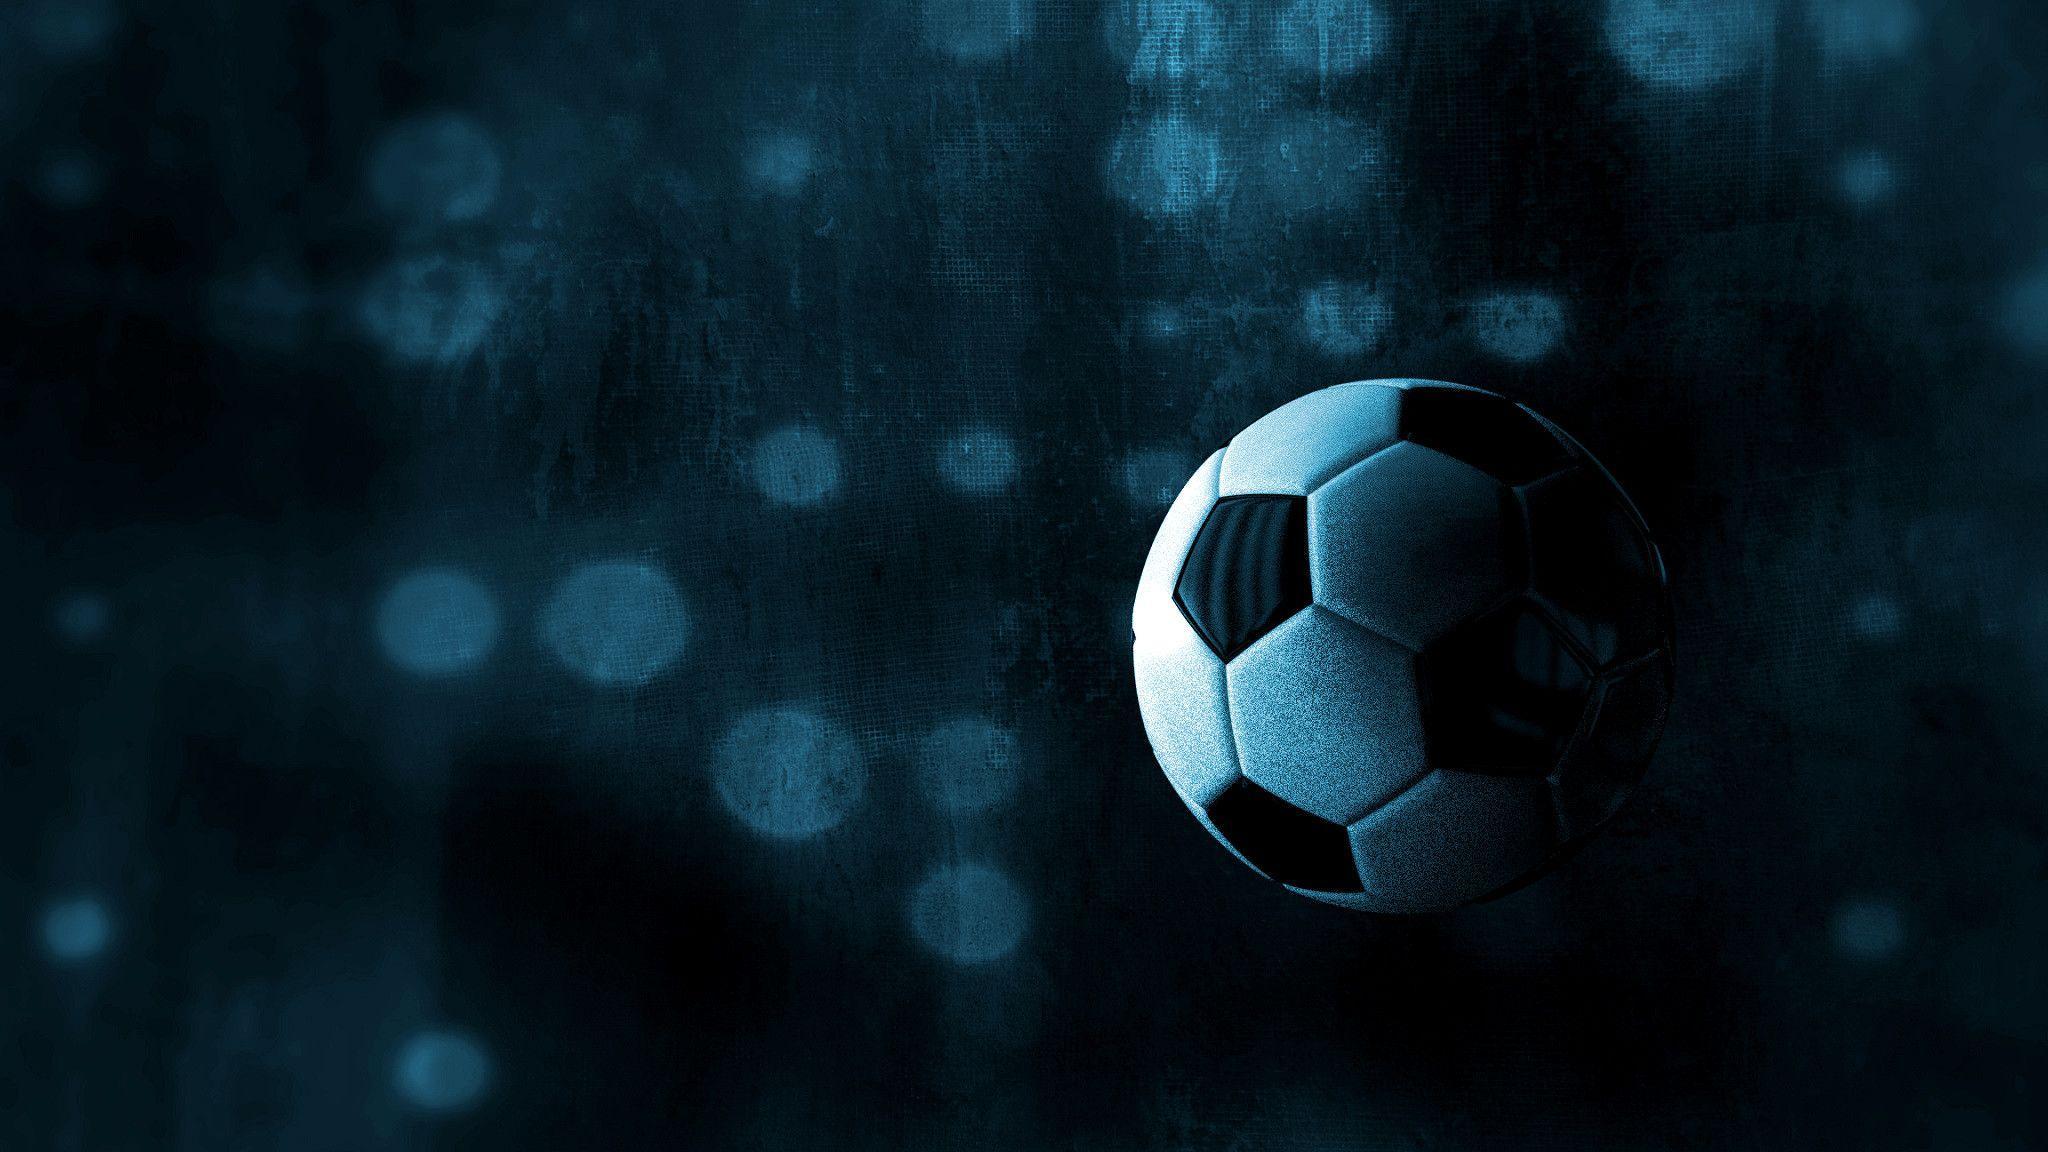 Dark Soccer Wallpapers Top Free Dark Soccer Backgrounds Wallpaperaccess